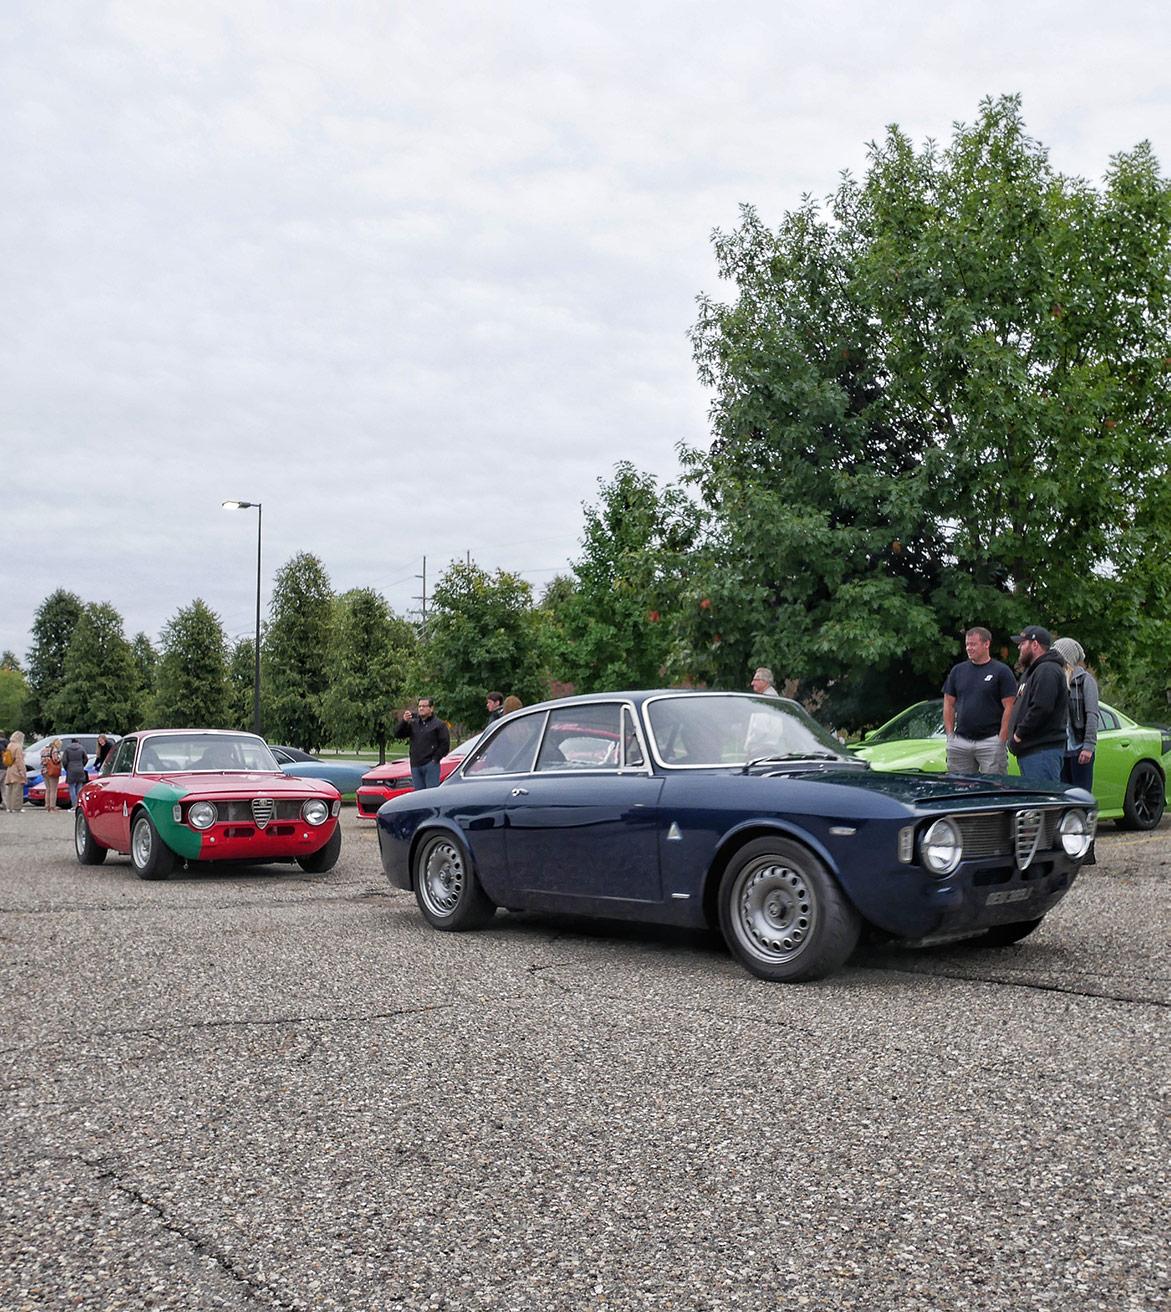 people looking at dodge vehicles on display